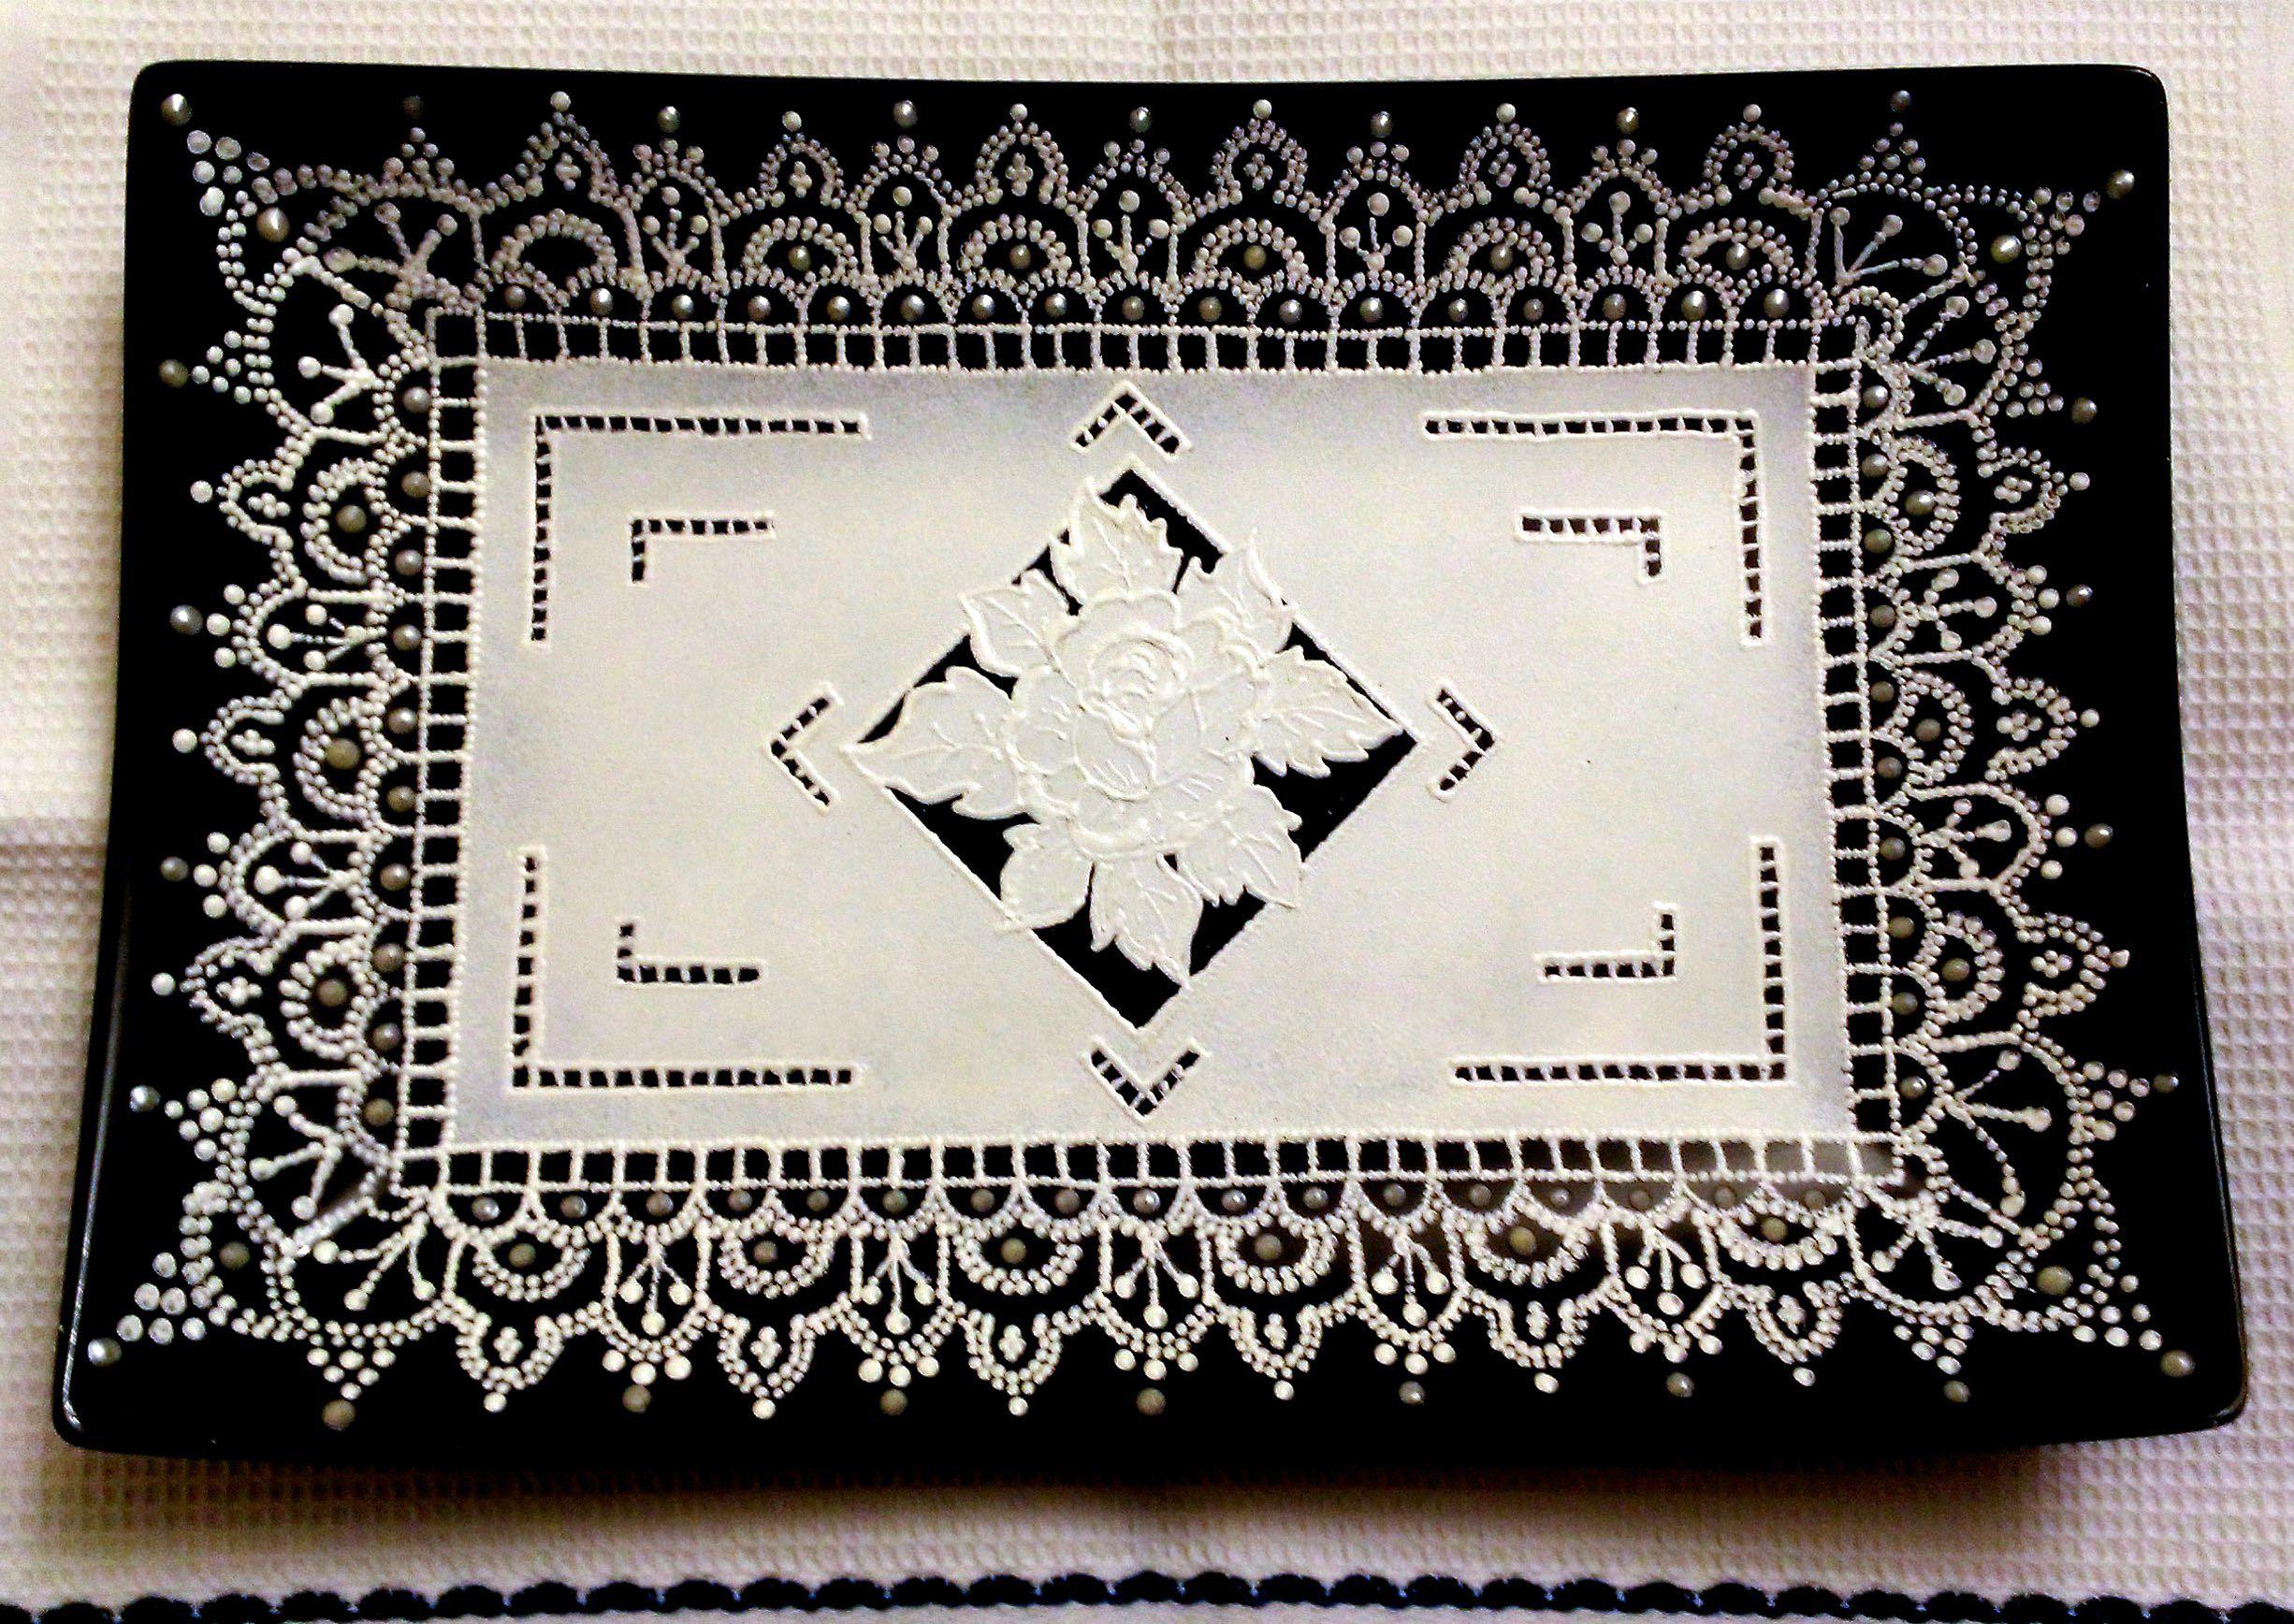 декоративнаятарелка тарелка точечнаяроспись handmade декор кружево ручнаяработа подарок